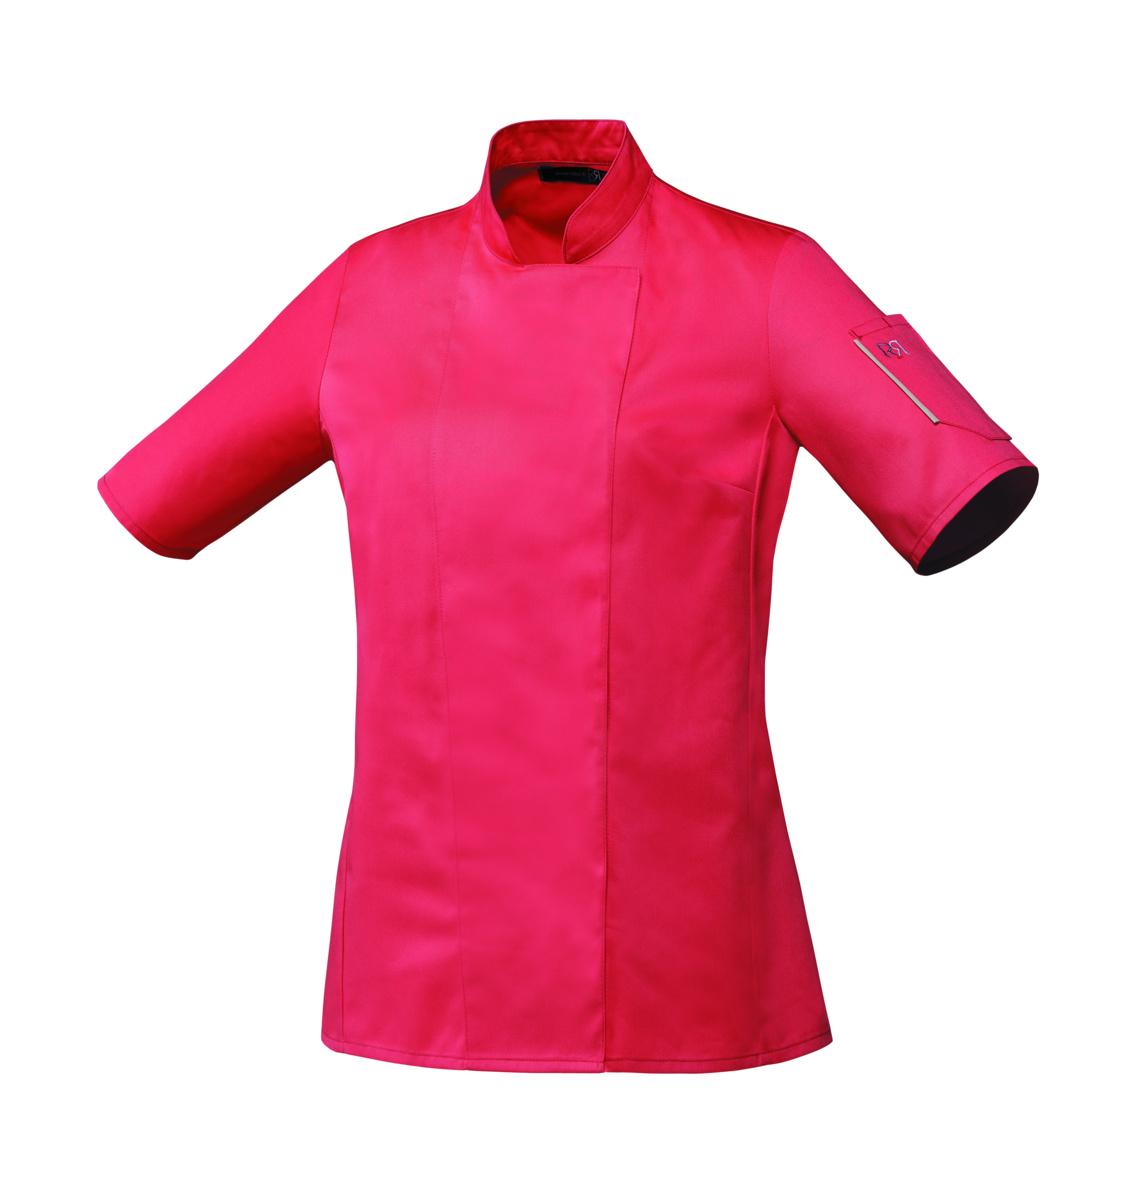 Veste femme rose taille 2 Unera Robur